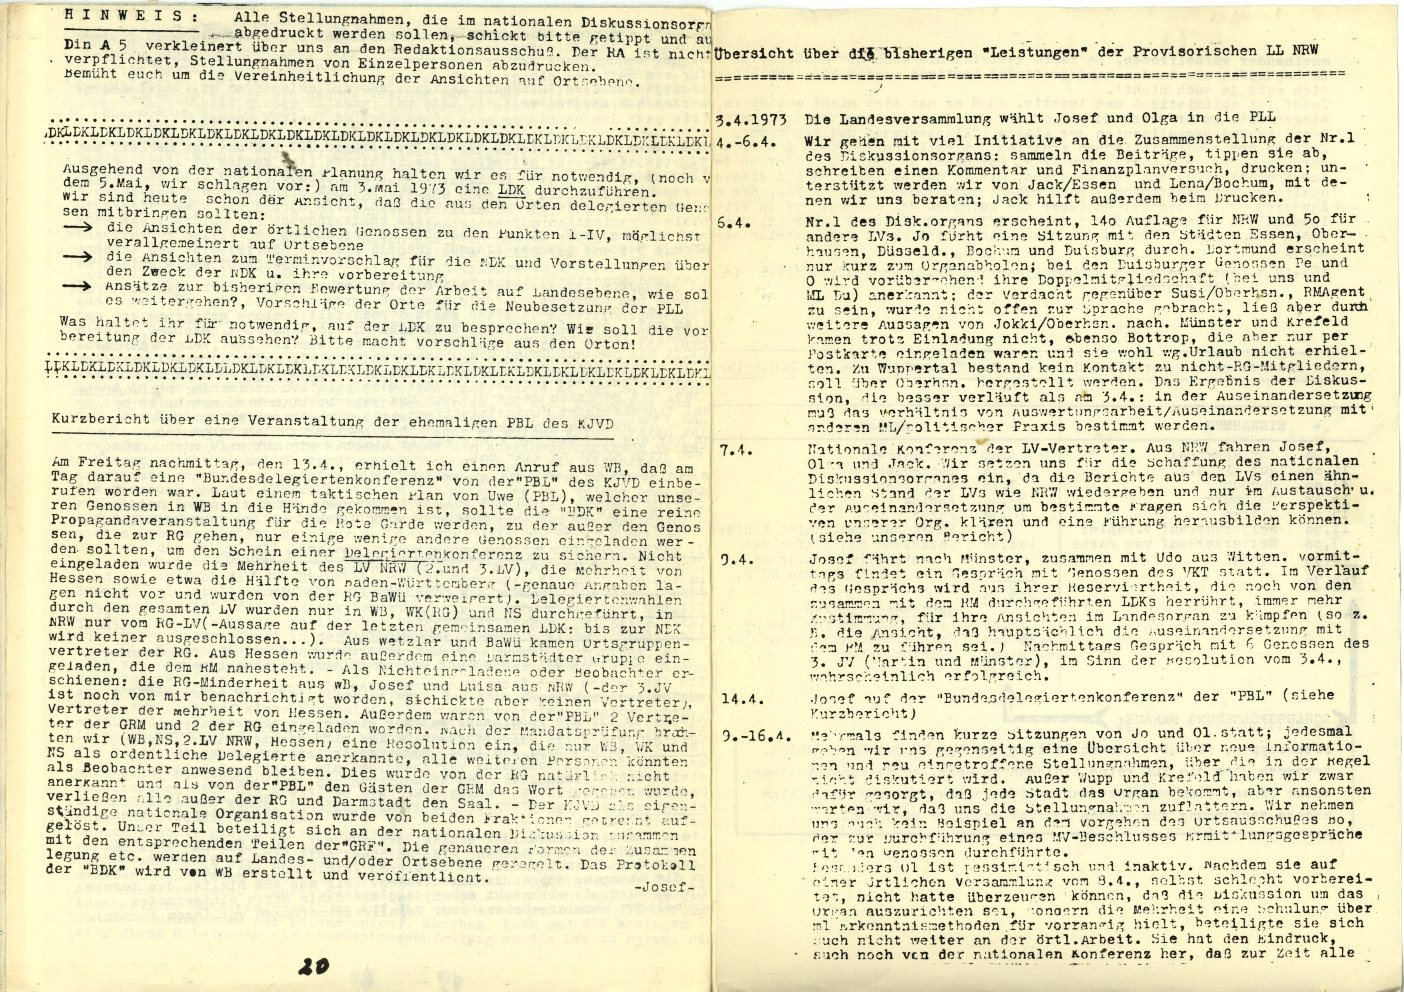 ZB_Rebellionsbewegung_Diskussionsorgan_19730419_08